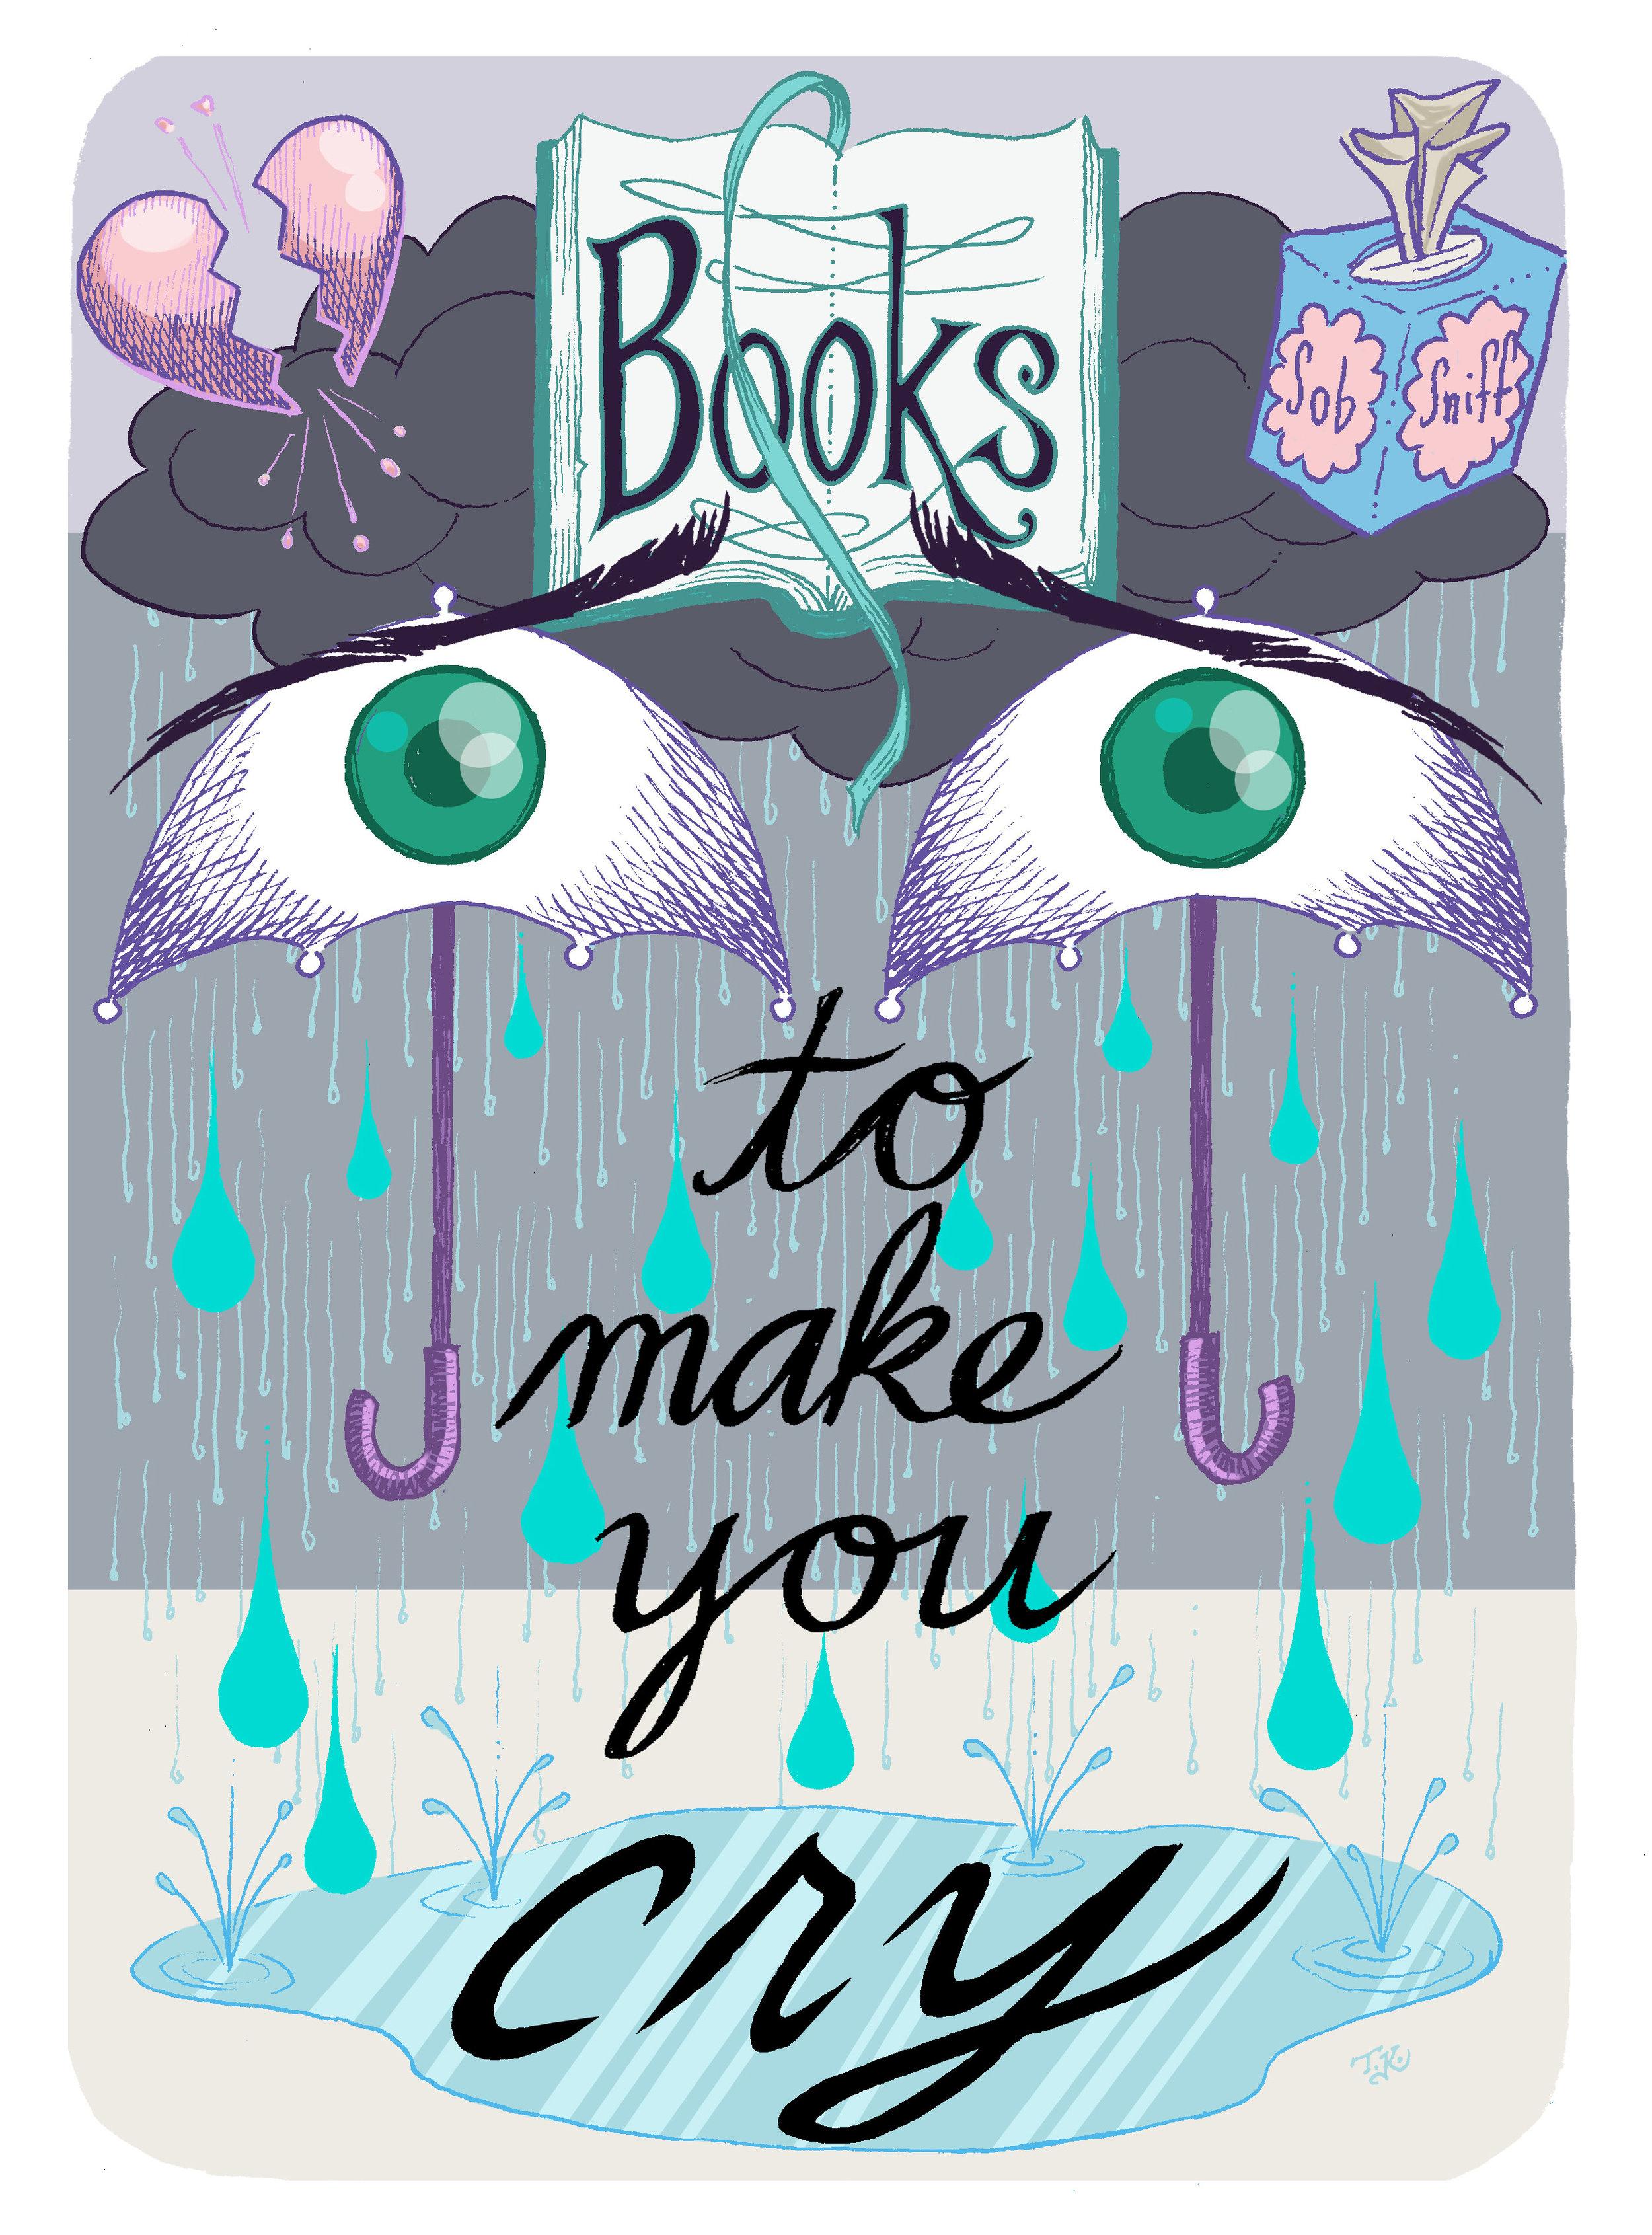 Books to make you cry